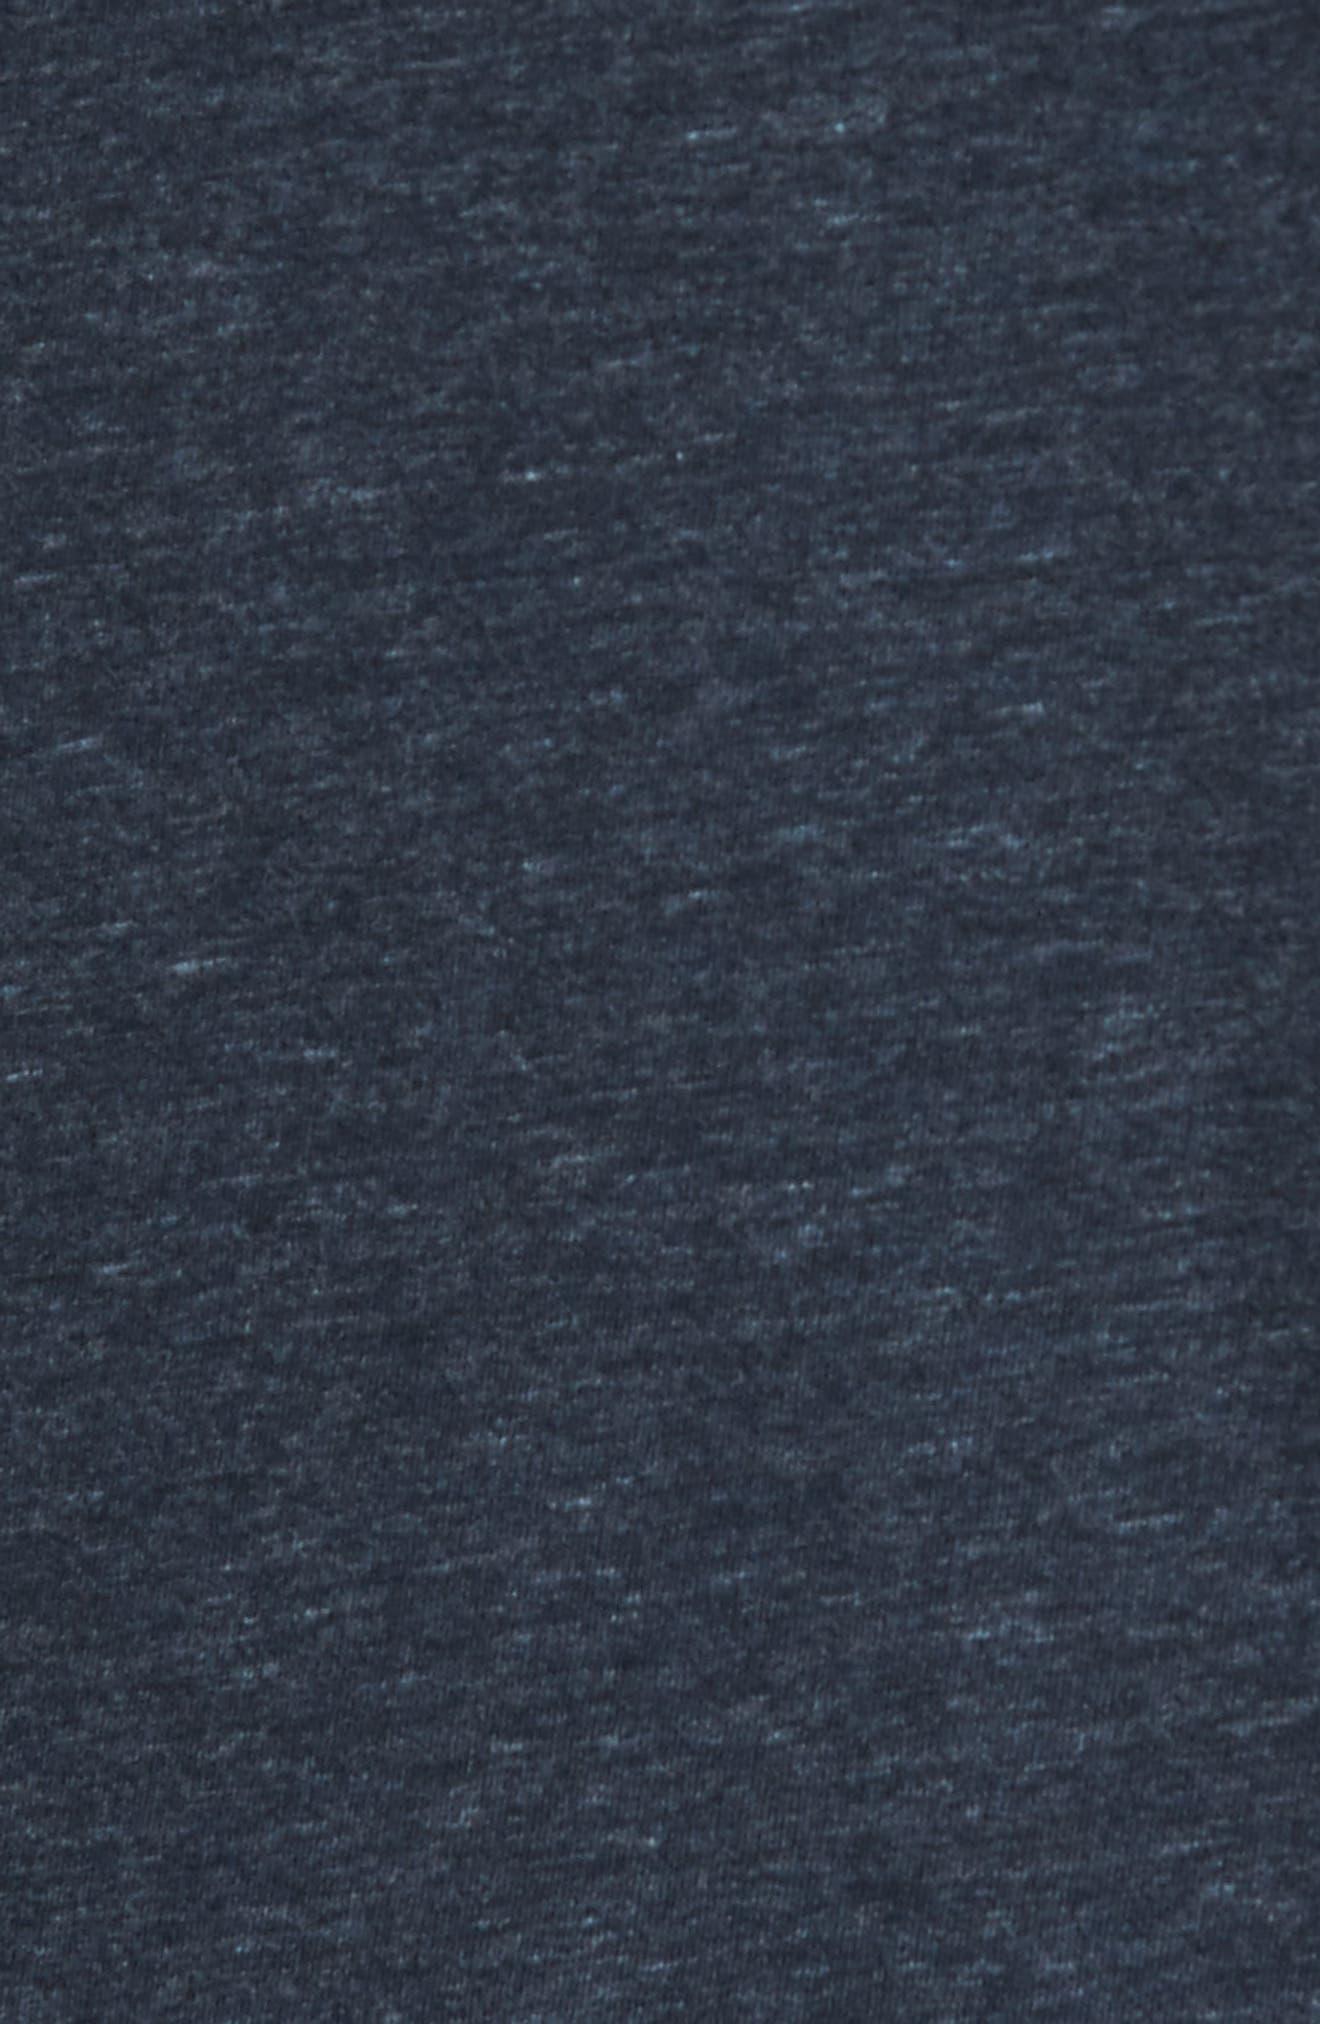 Flynn V-Neck T-Shirt,                             Alternate thumbnail 5, color,                             NAVY